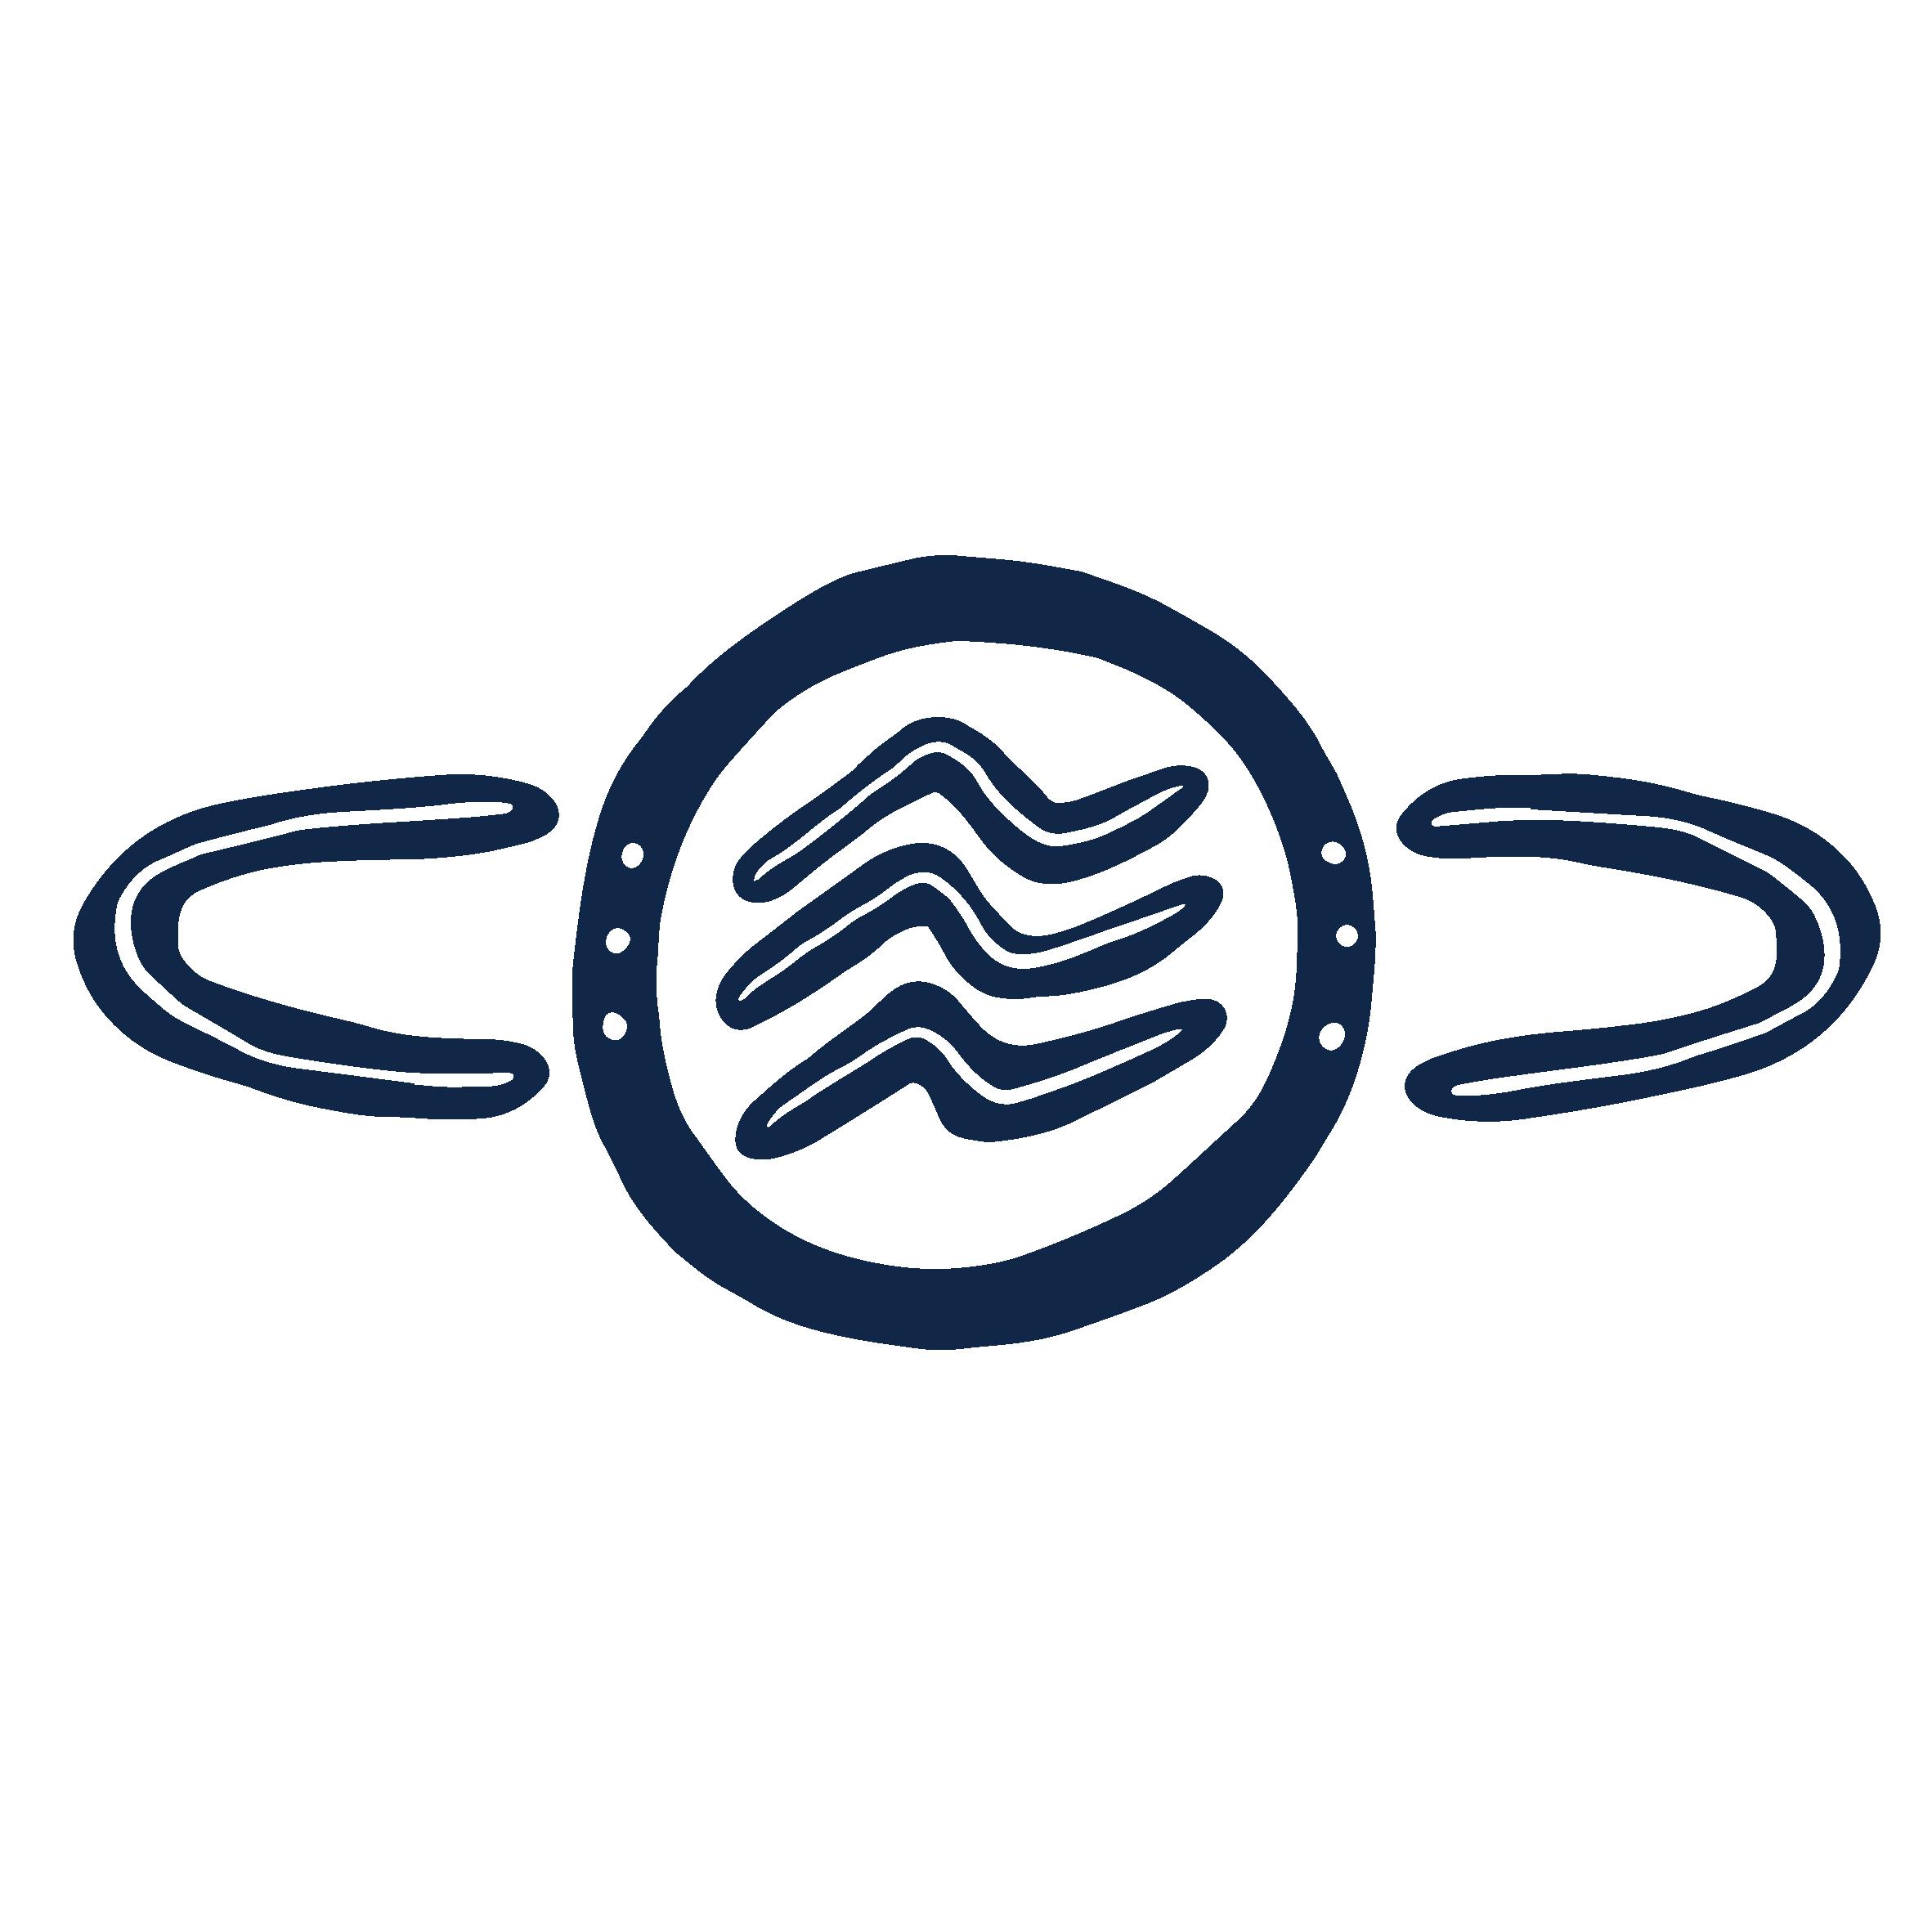 YLab First Nations logo - featuring illustrative wave and circular symbols.